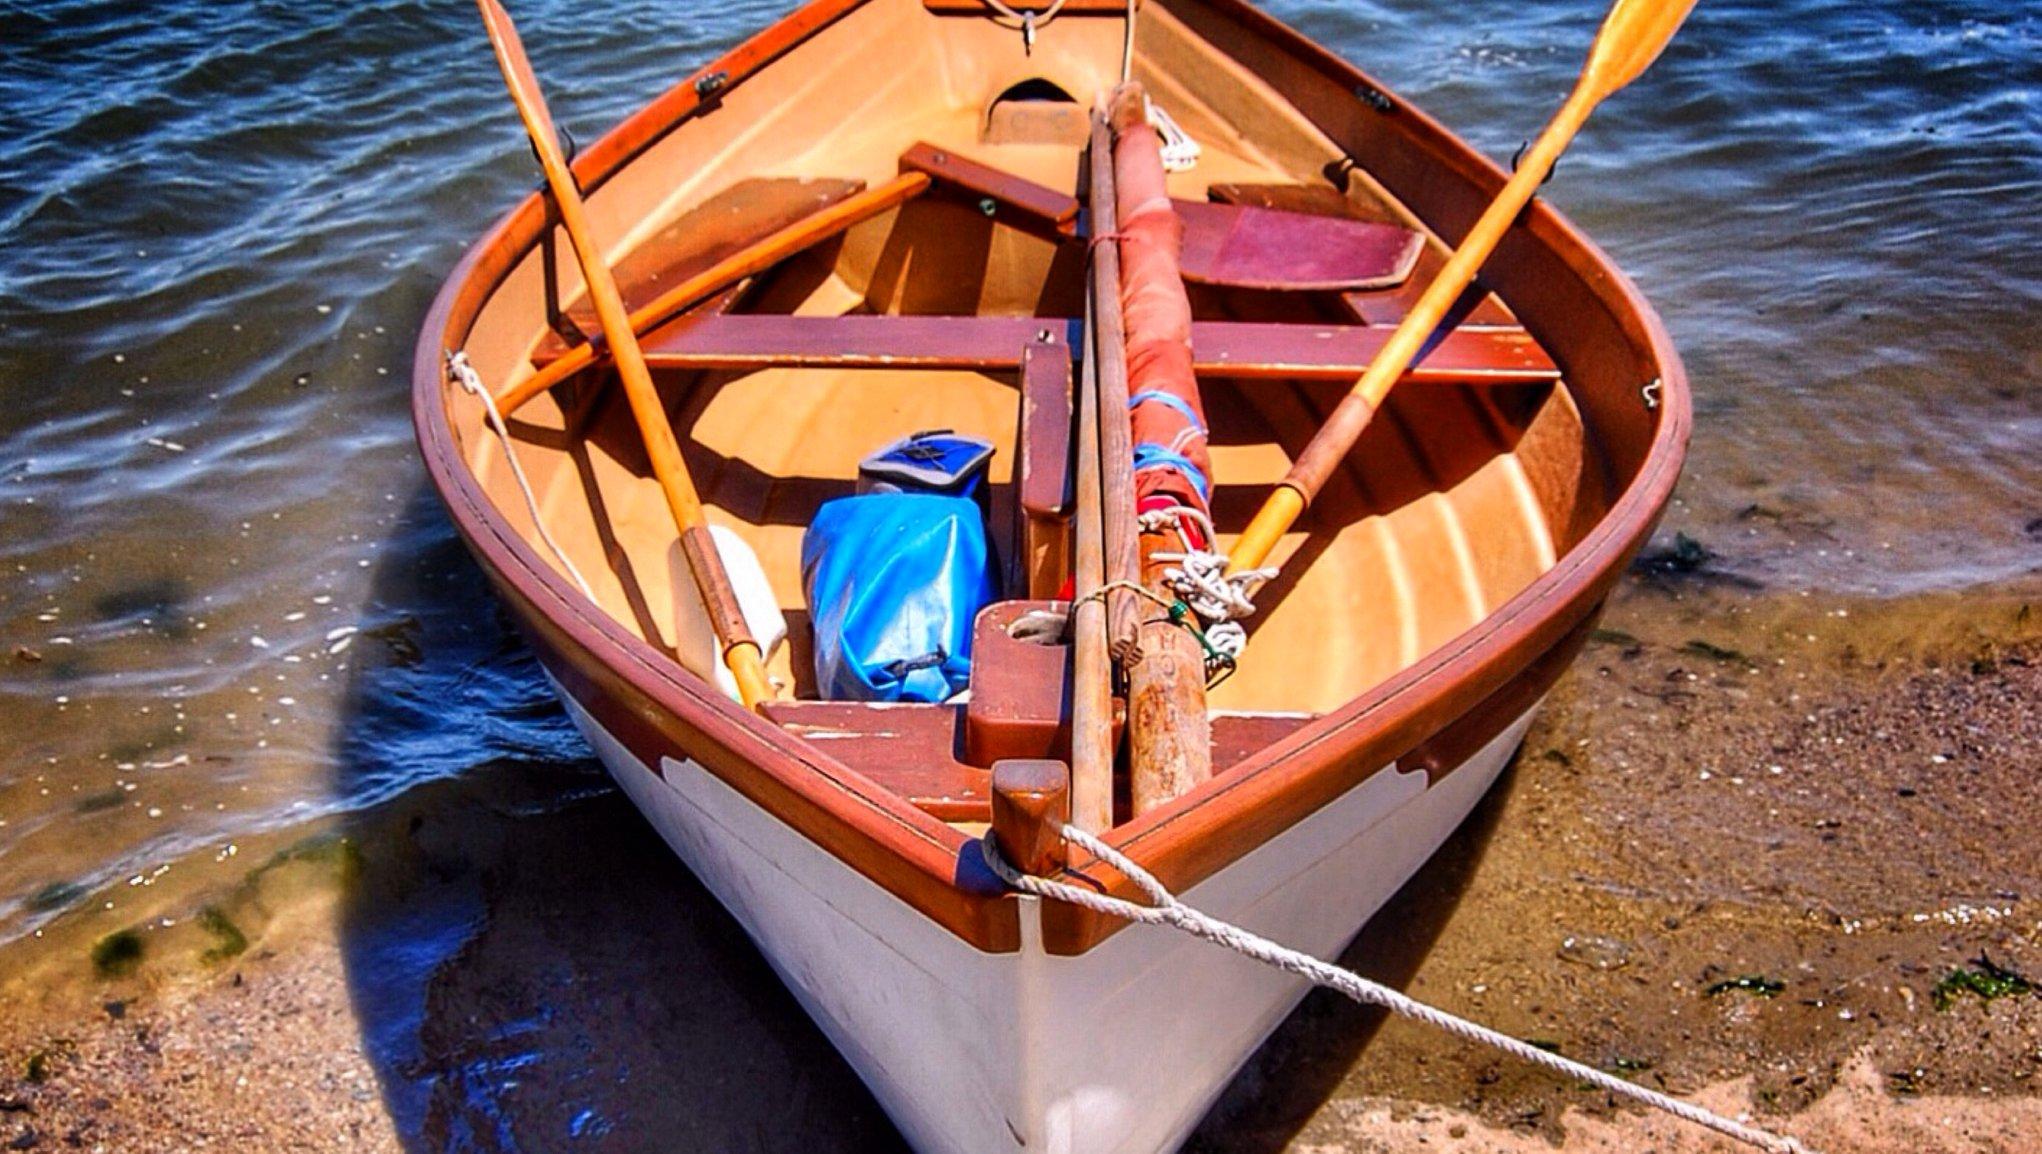 Liten båt